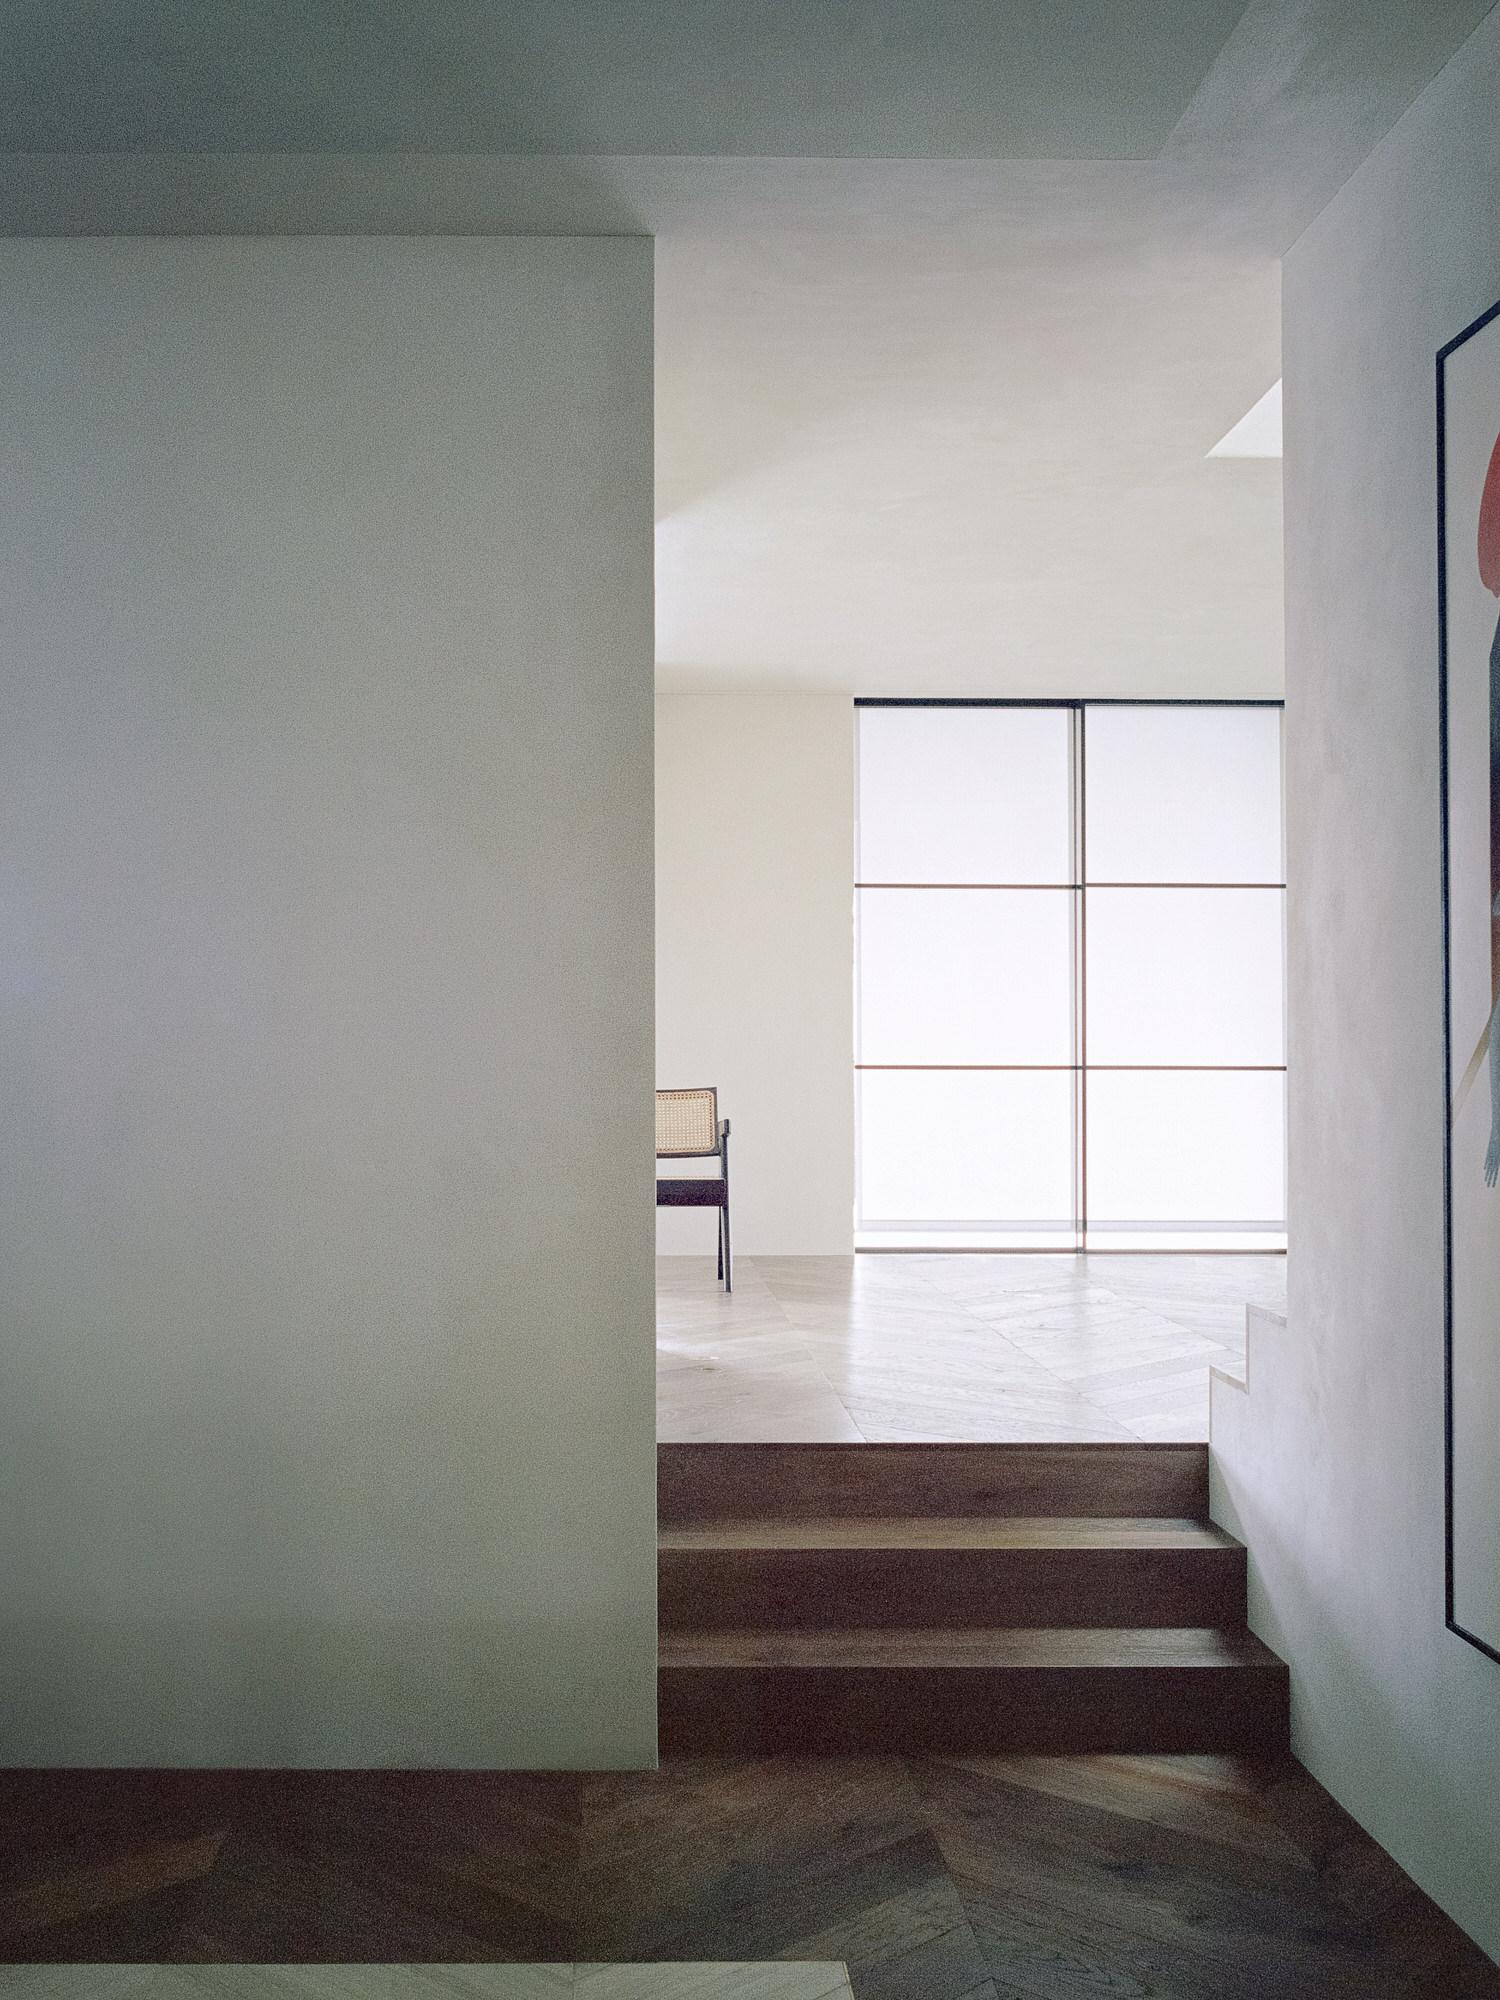 Think Architecture, Haus Am Weinberg, Lake Zurich, Swiss Architecture, Photo Simone Bossi | Yellowtrace